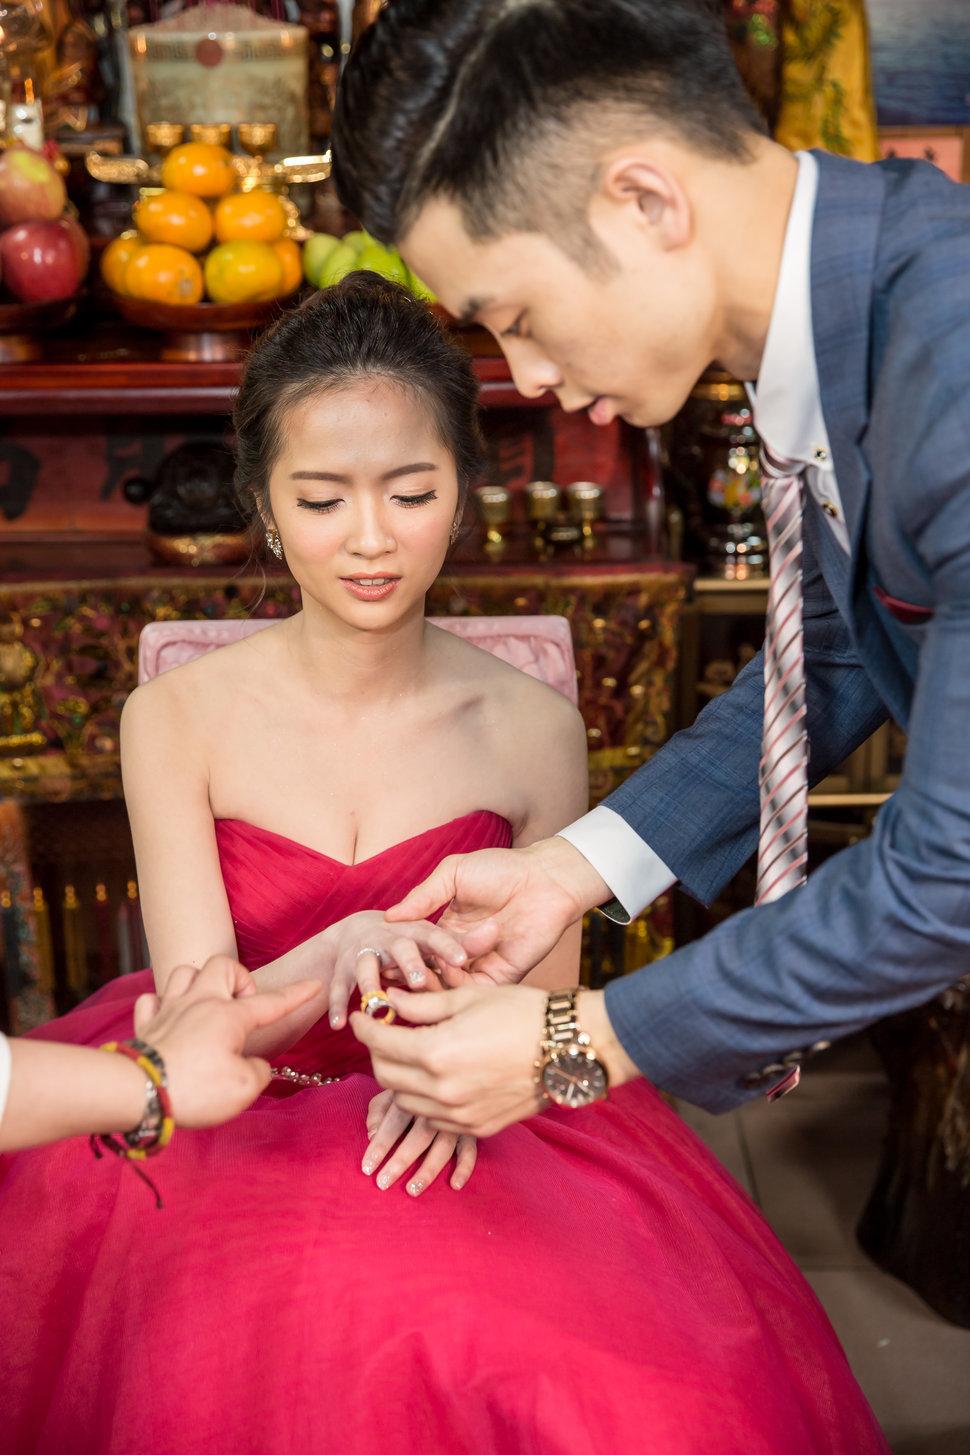 SIN_8128 - 板橋唐朝婚紗 - 結婚吧一站式婚禮服務平台